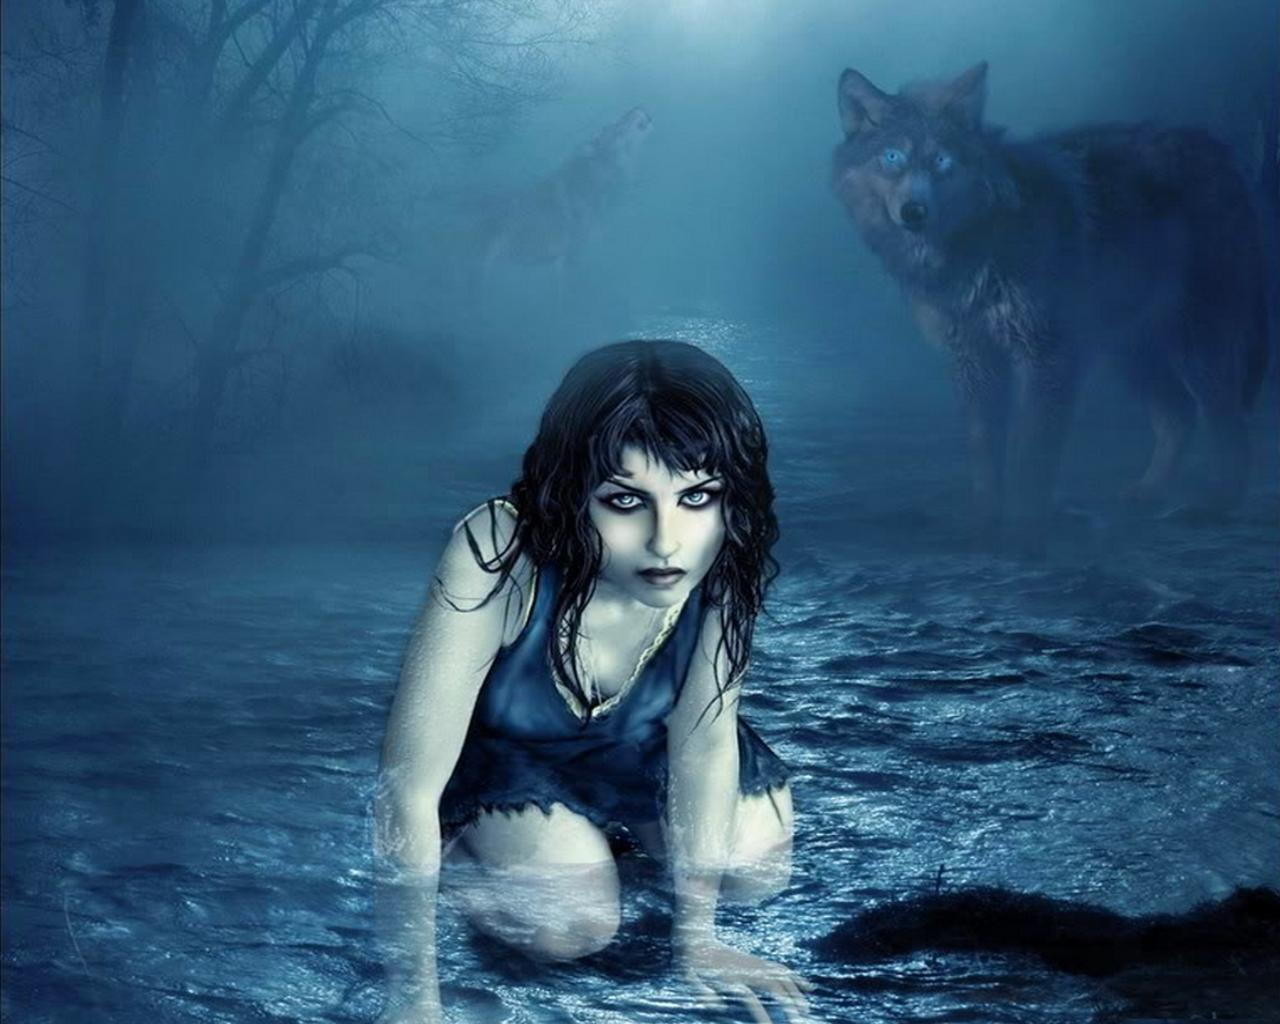 Girl Wallpaper: Wolf Girl Wallpaper